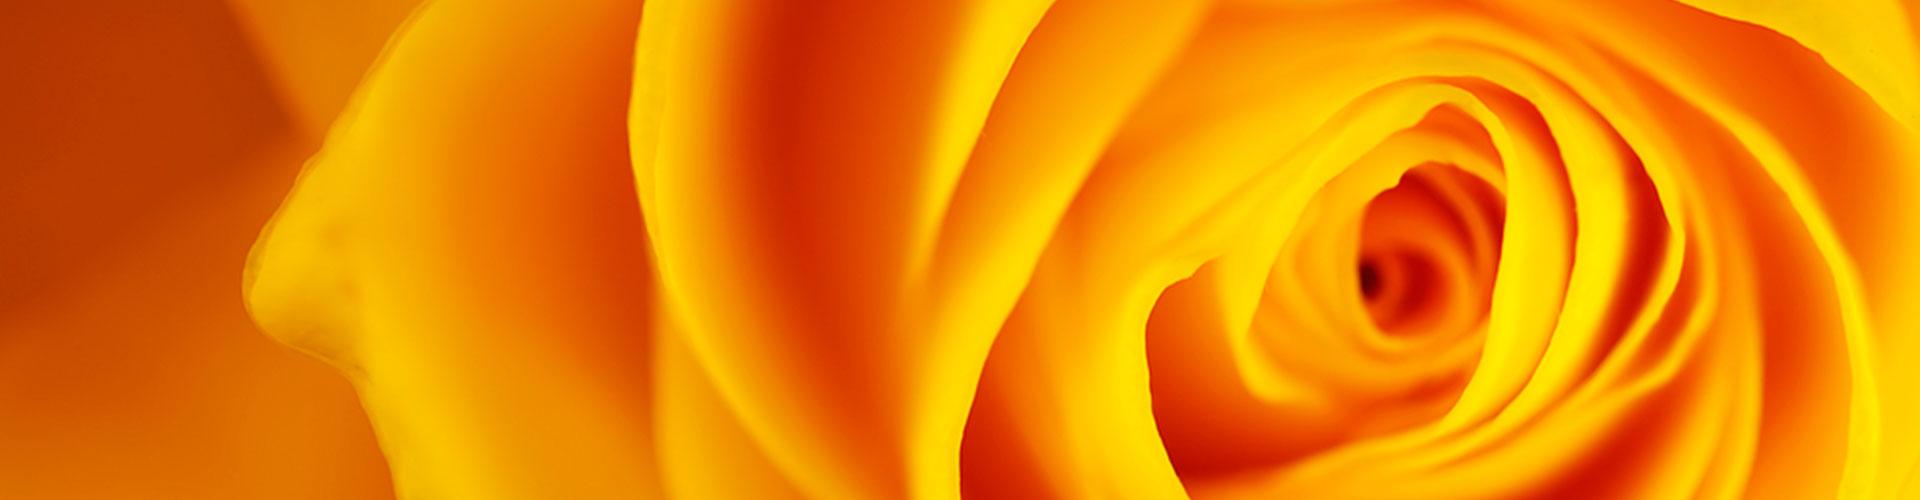 spirali-01